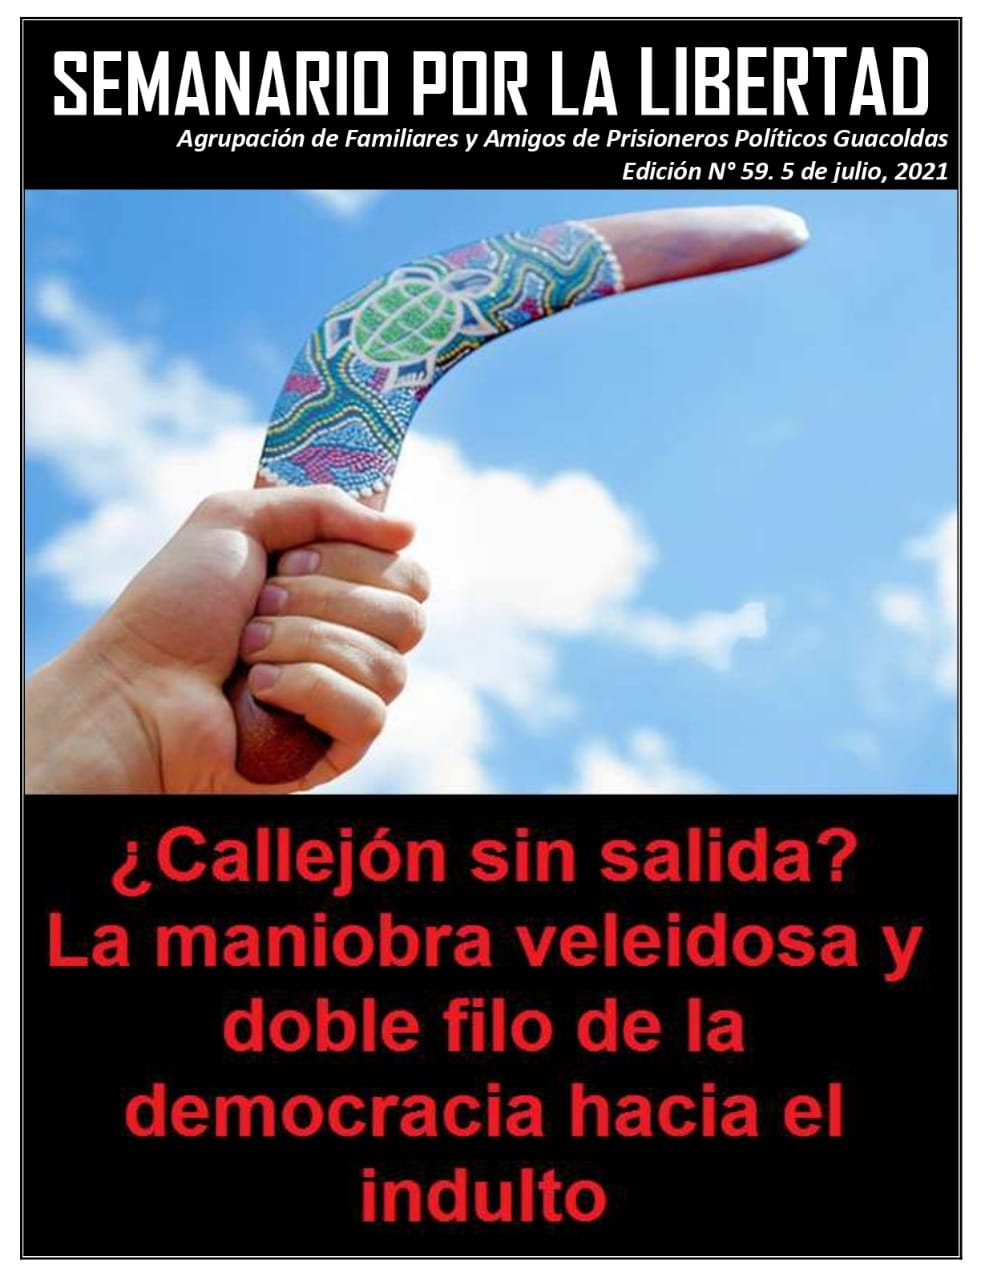 CHILE: ¿CALLEJÓN SIN SALIDA?